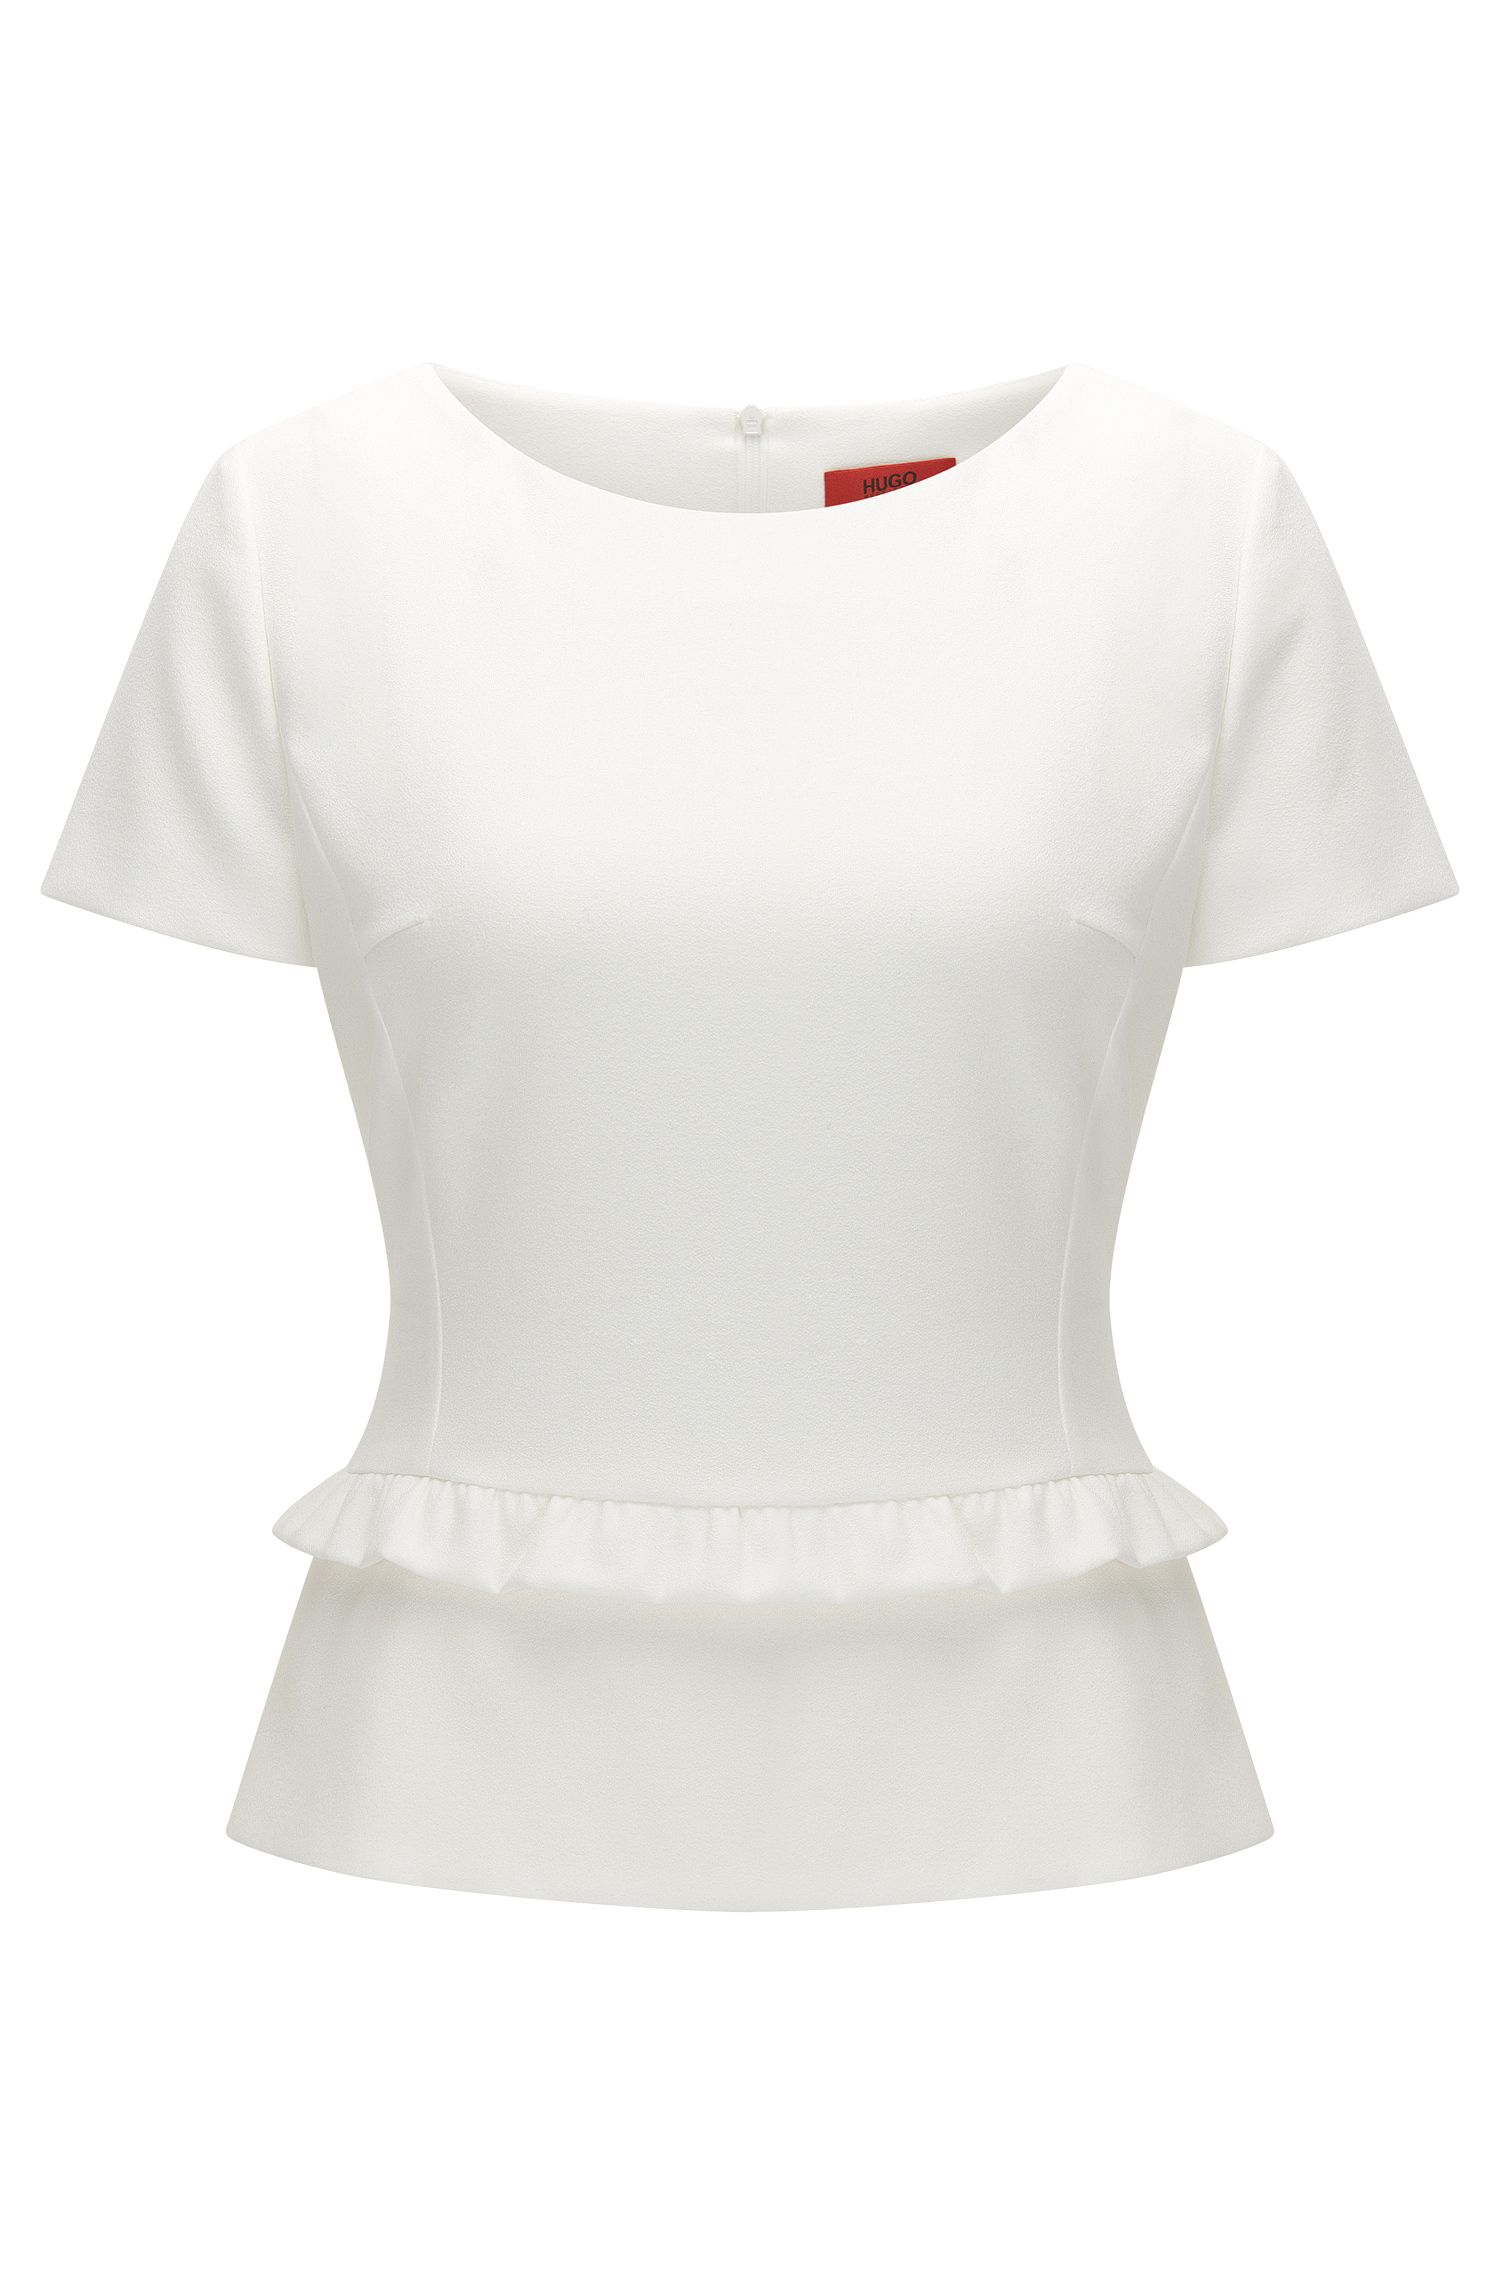 Regular-fit top with ruffled peplum